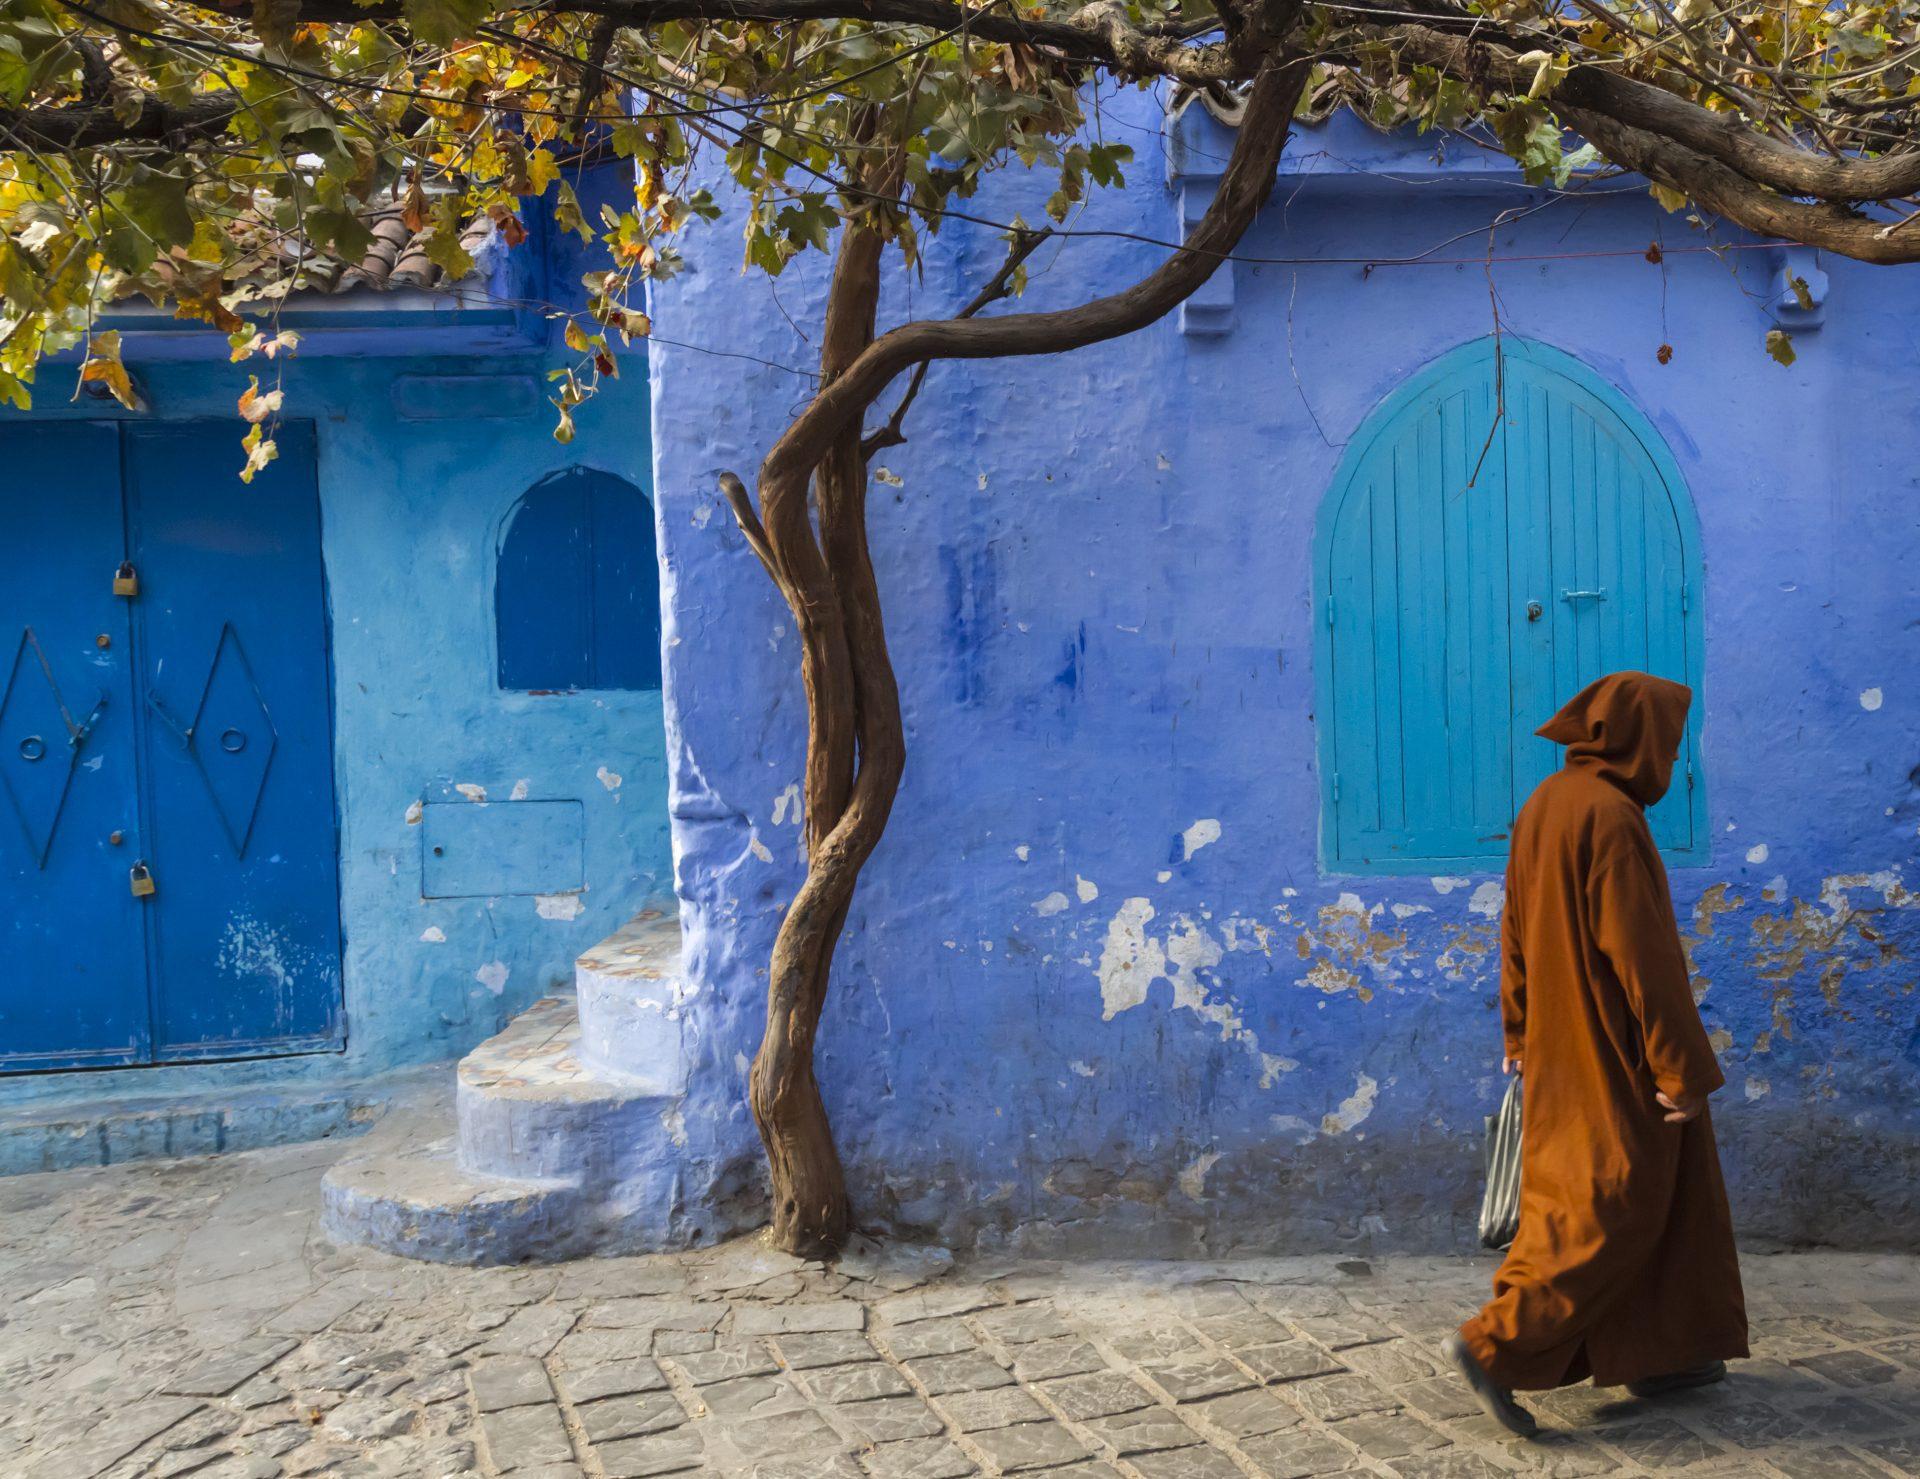 Morocco Chefchaouen